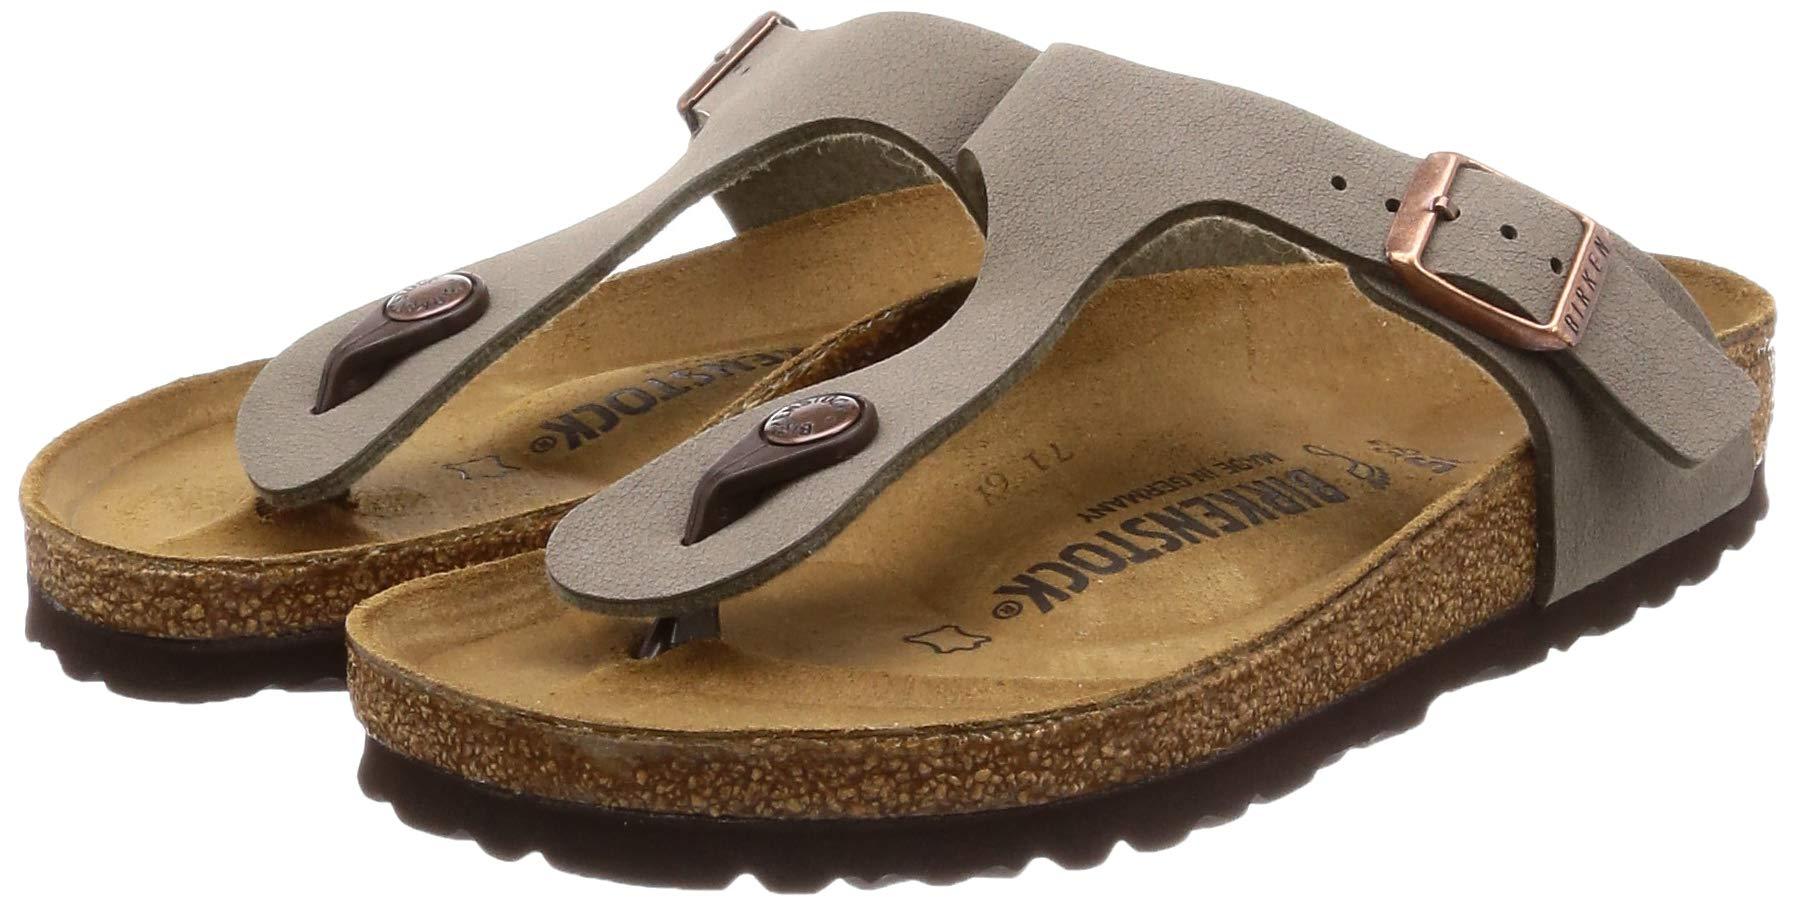 Birkenstock Gizeh, Women's Sandals (845123)